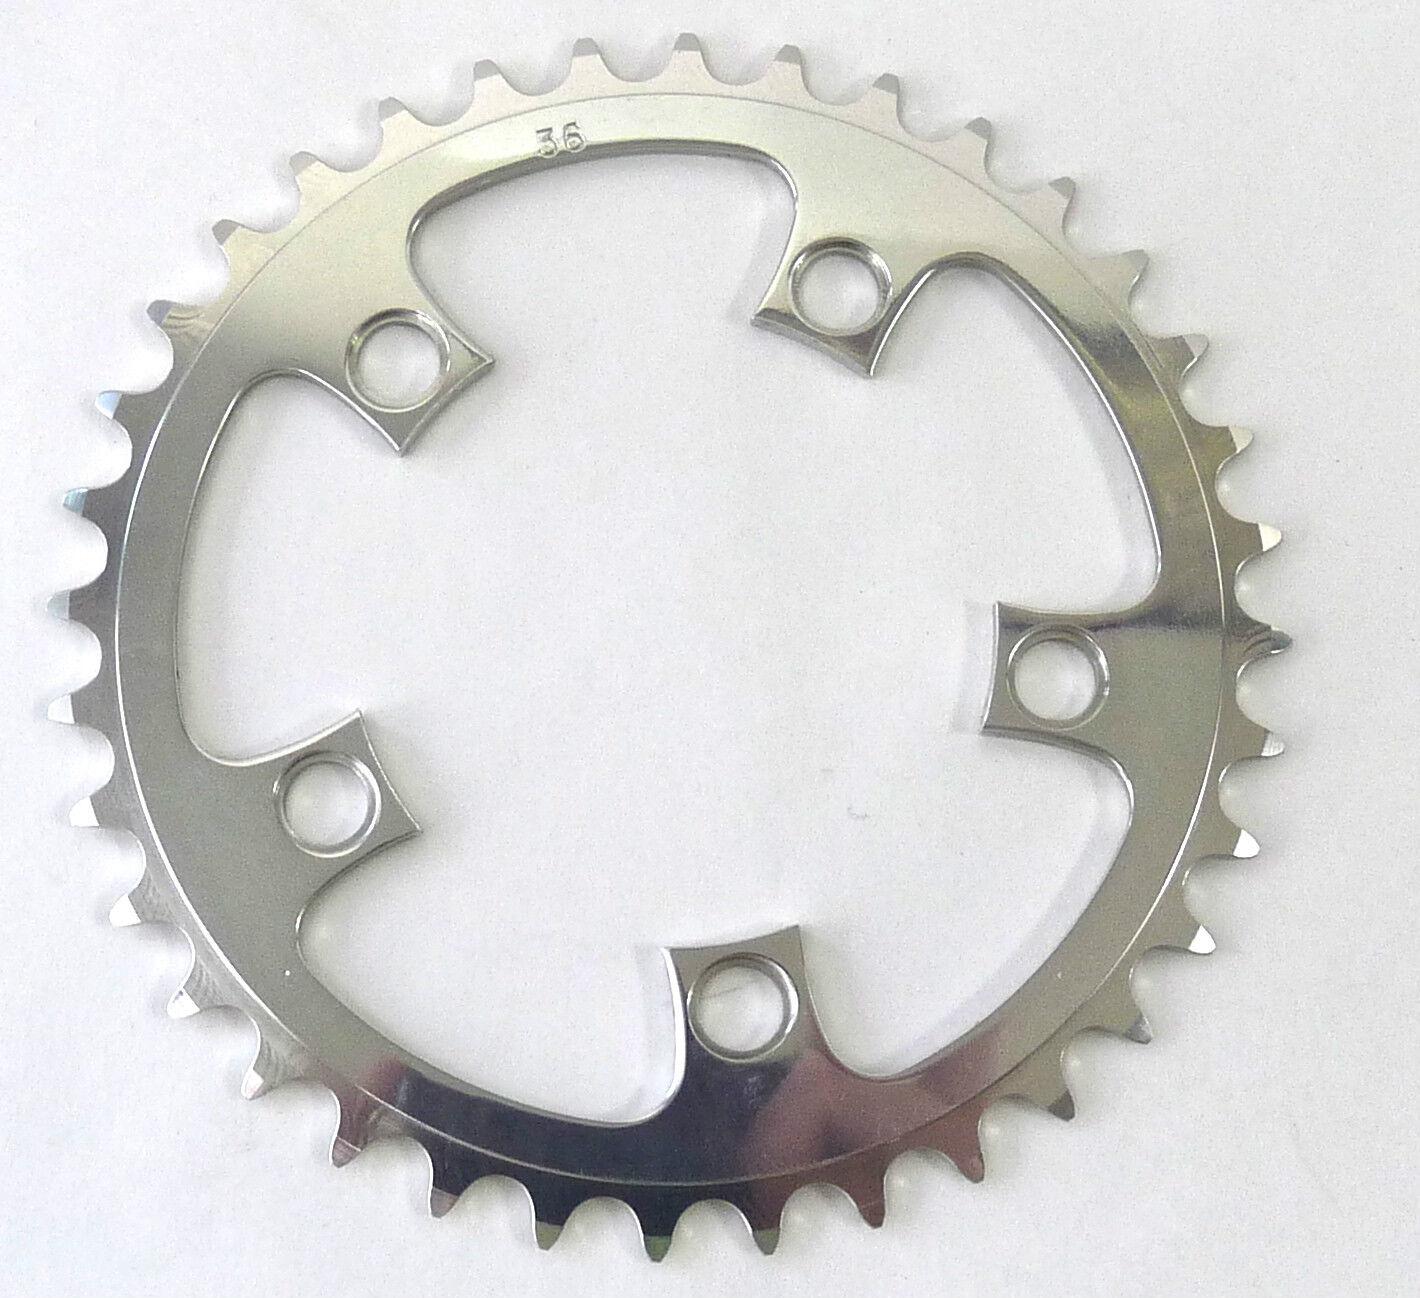 T.A. Chainring 36T 94 BCD Aluminum  3 32  VINTAGE OLD Road bike triple NOS